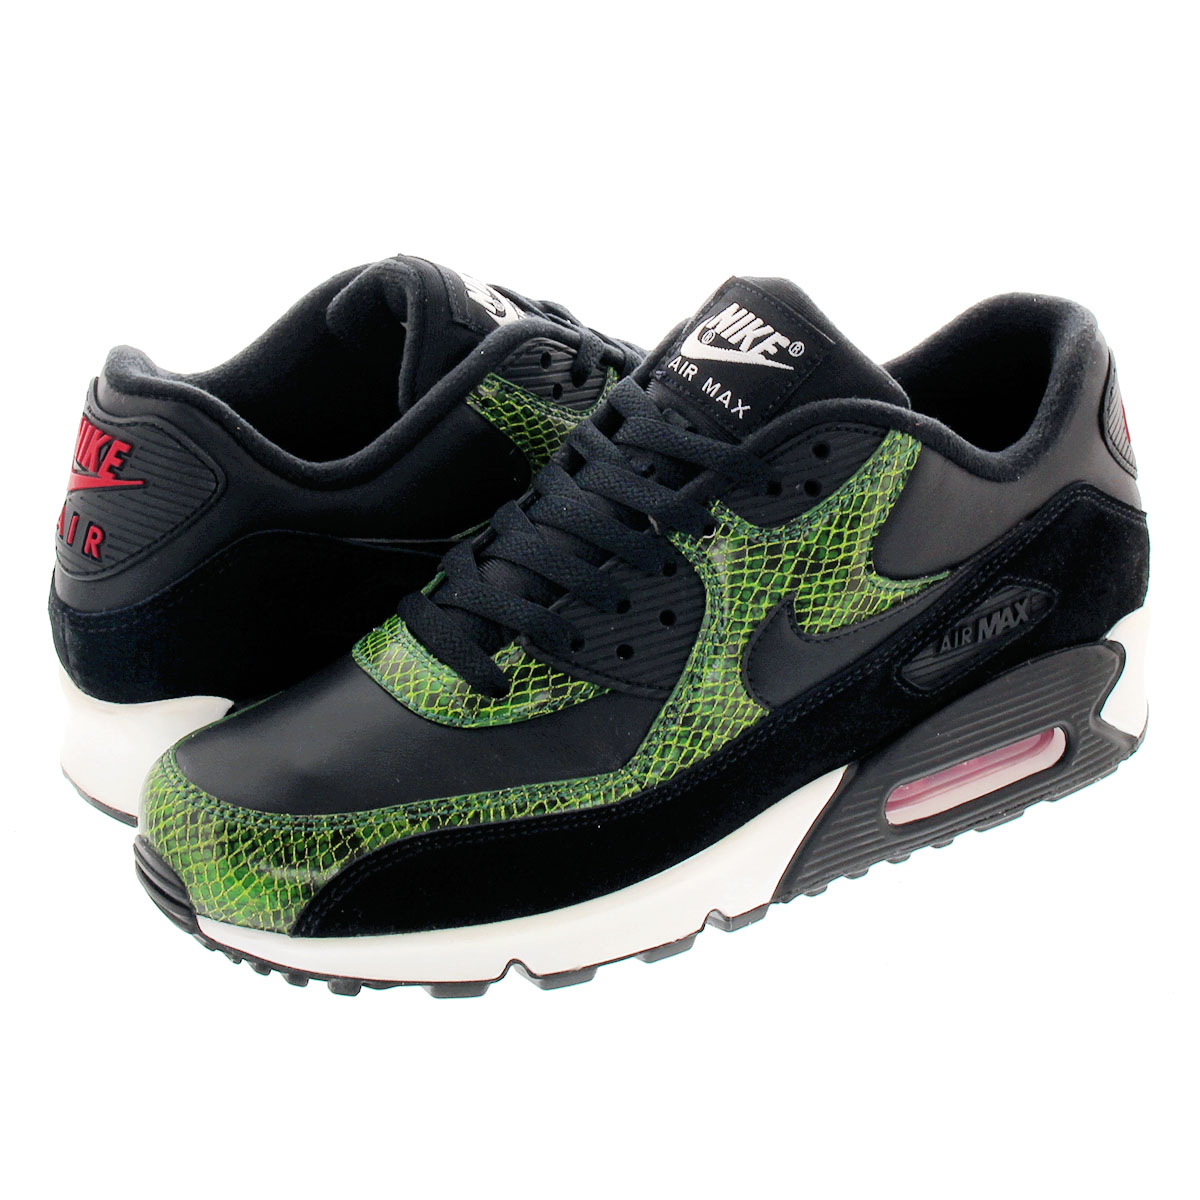 Nike Air Max 90 QS 'New Python' BlackBlack Cyber Fir CD0916 001